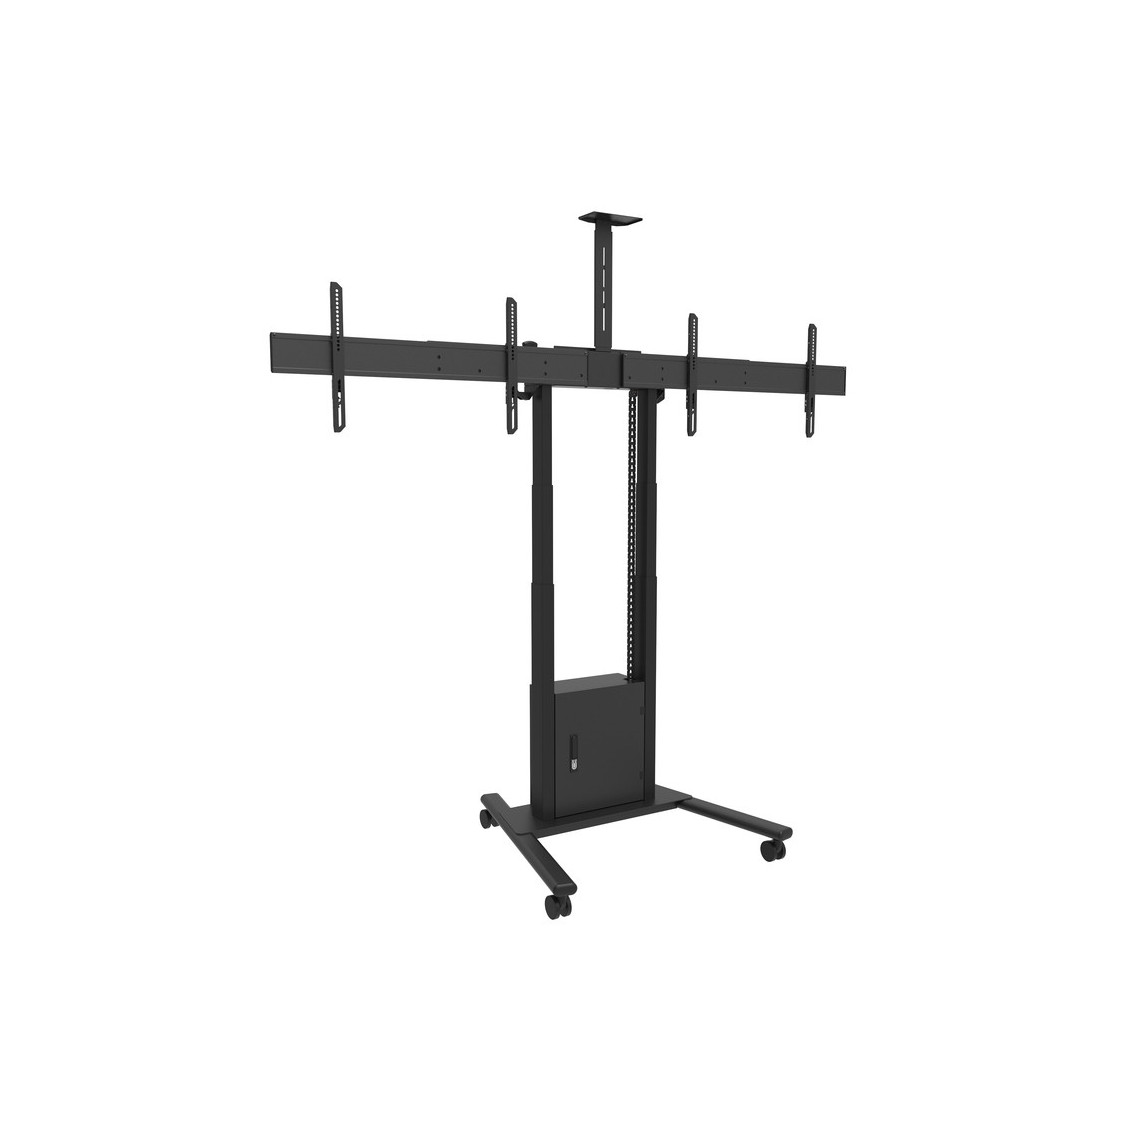 M Motorized Floorstand Dual Screen incl cabinet & cam-shelf 120kg